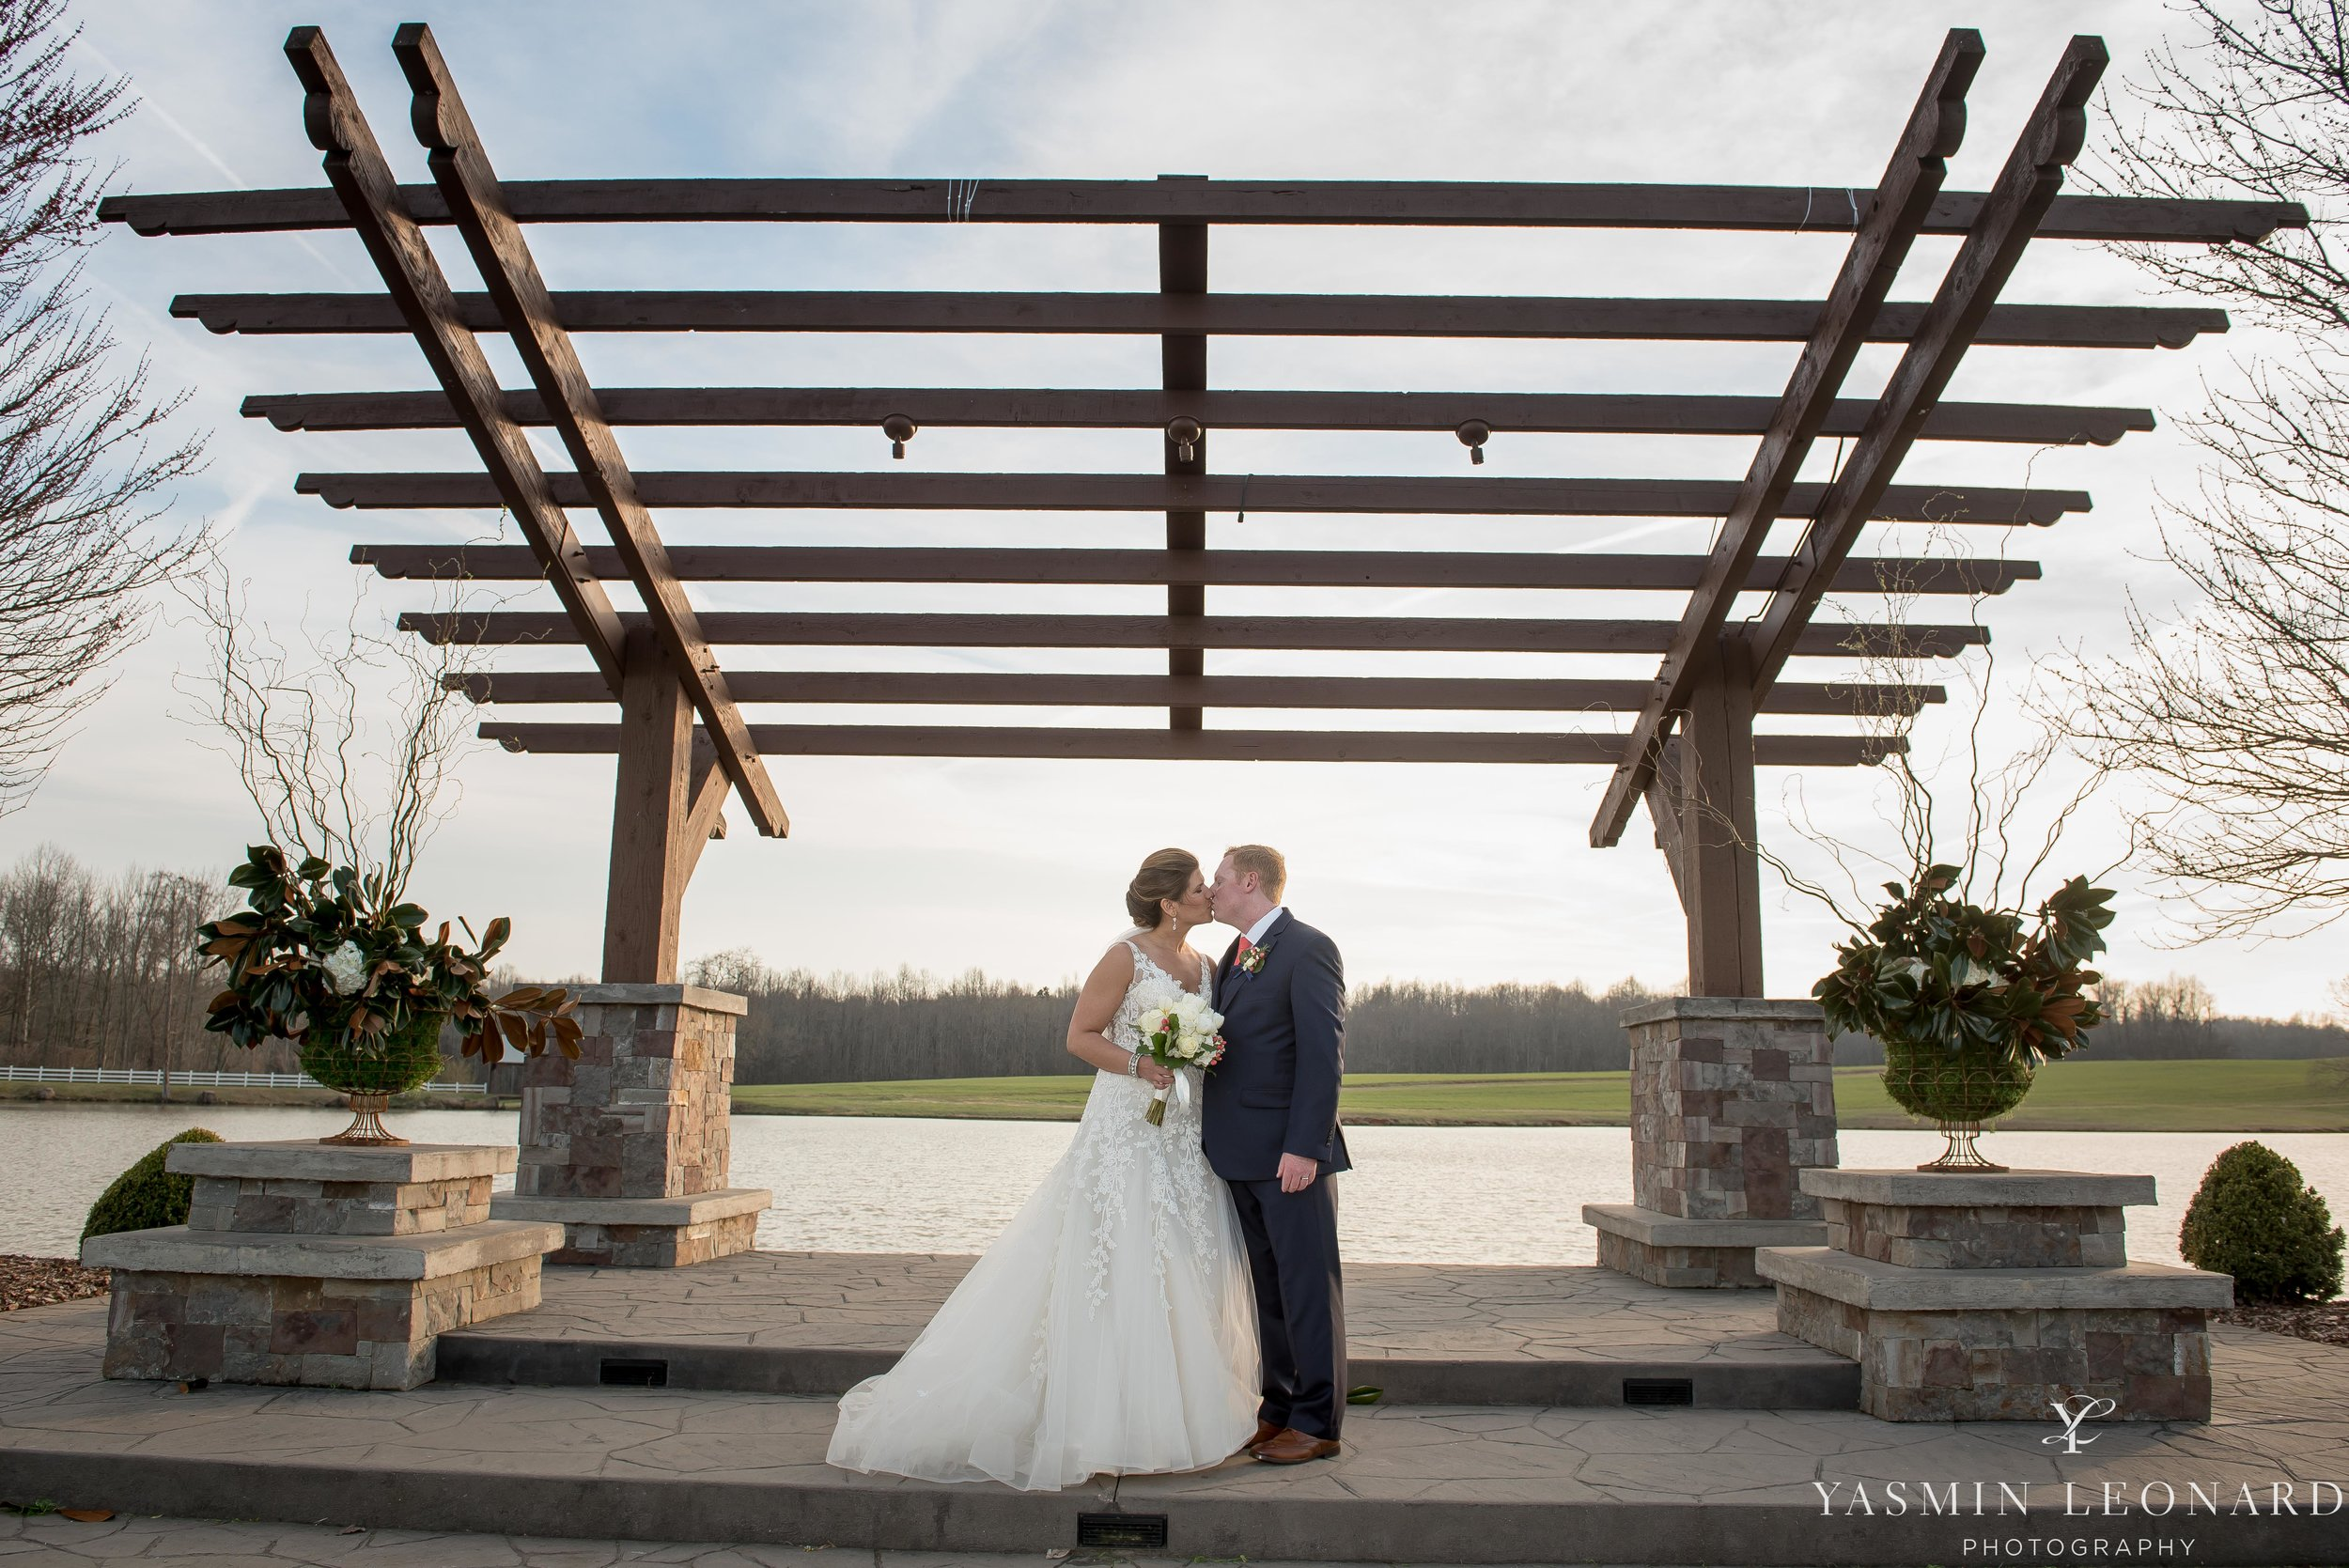 Adaumont Farm - Adaumont Farm Weddings - Trinity Weddings - NC Weddings - Yasmin Leonard Photography-41.jpg